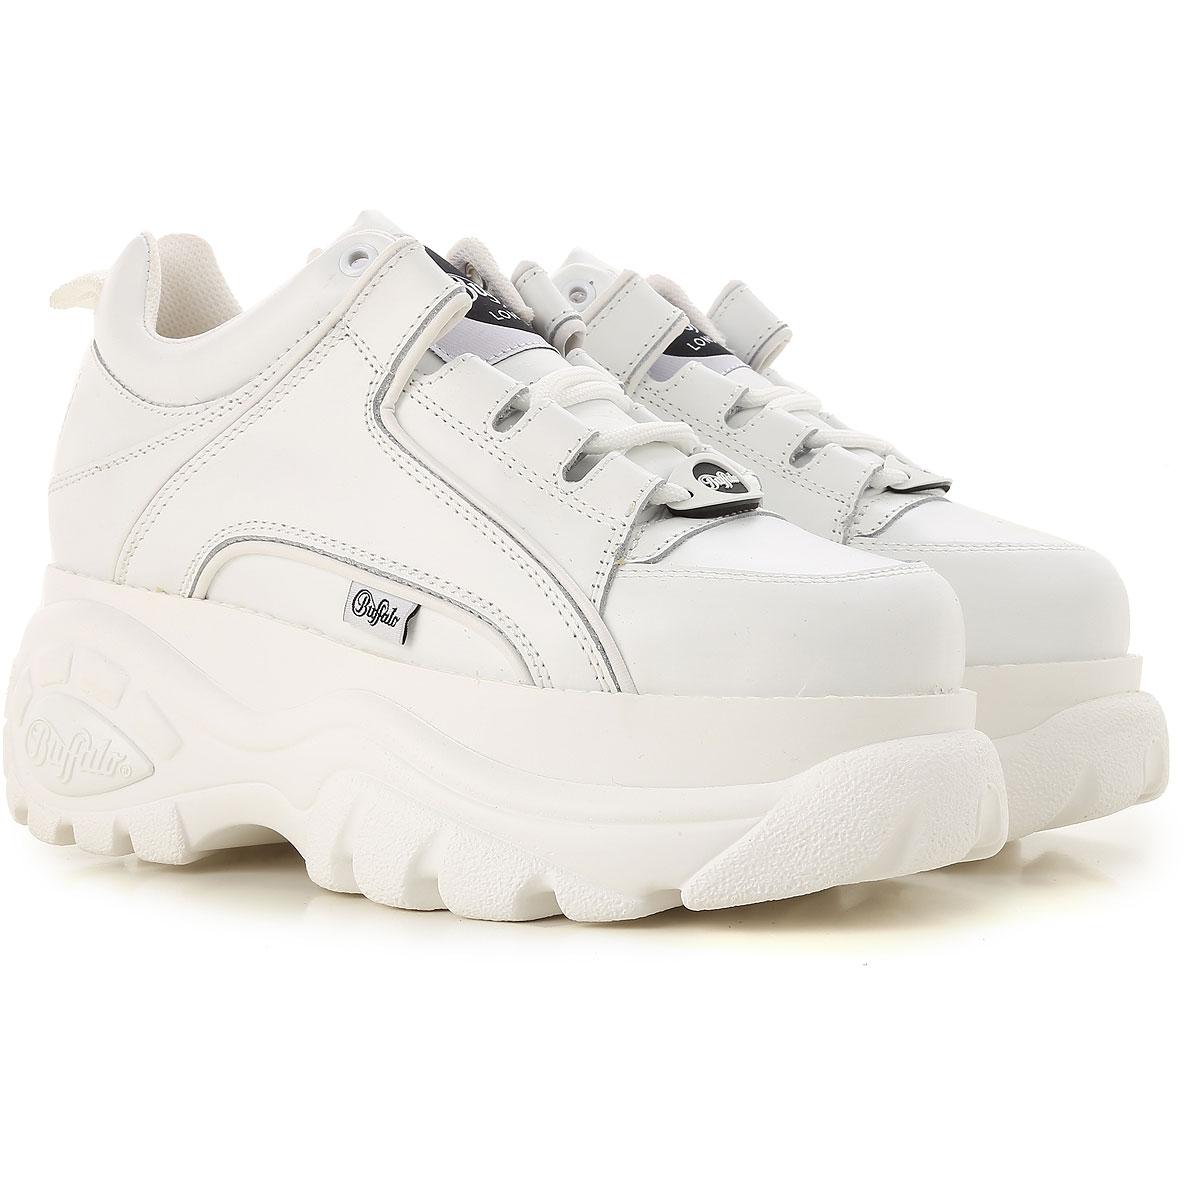 Buffalo Sneakers for Women On Sale, White, Leather, 2019, UK 7 - EU 40 - US 10 UK 6 - EU 40 - US 9 UK 7 - EU 41 - US 10